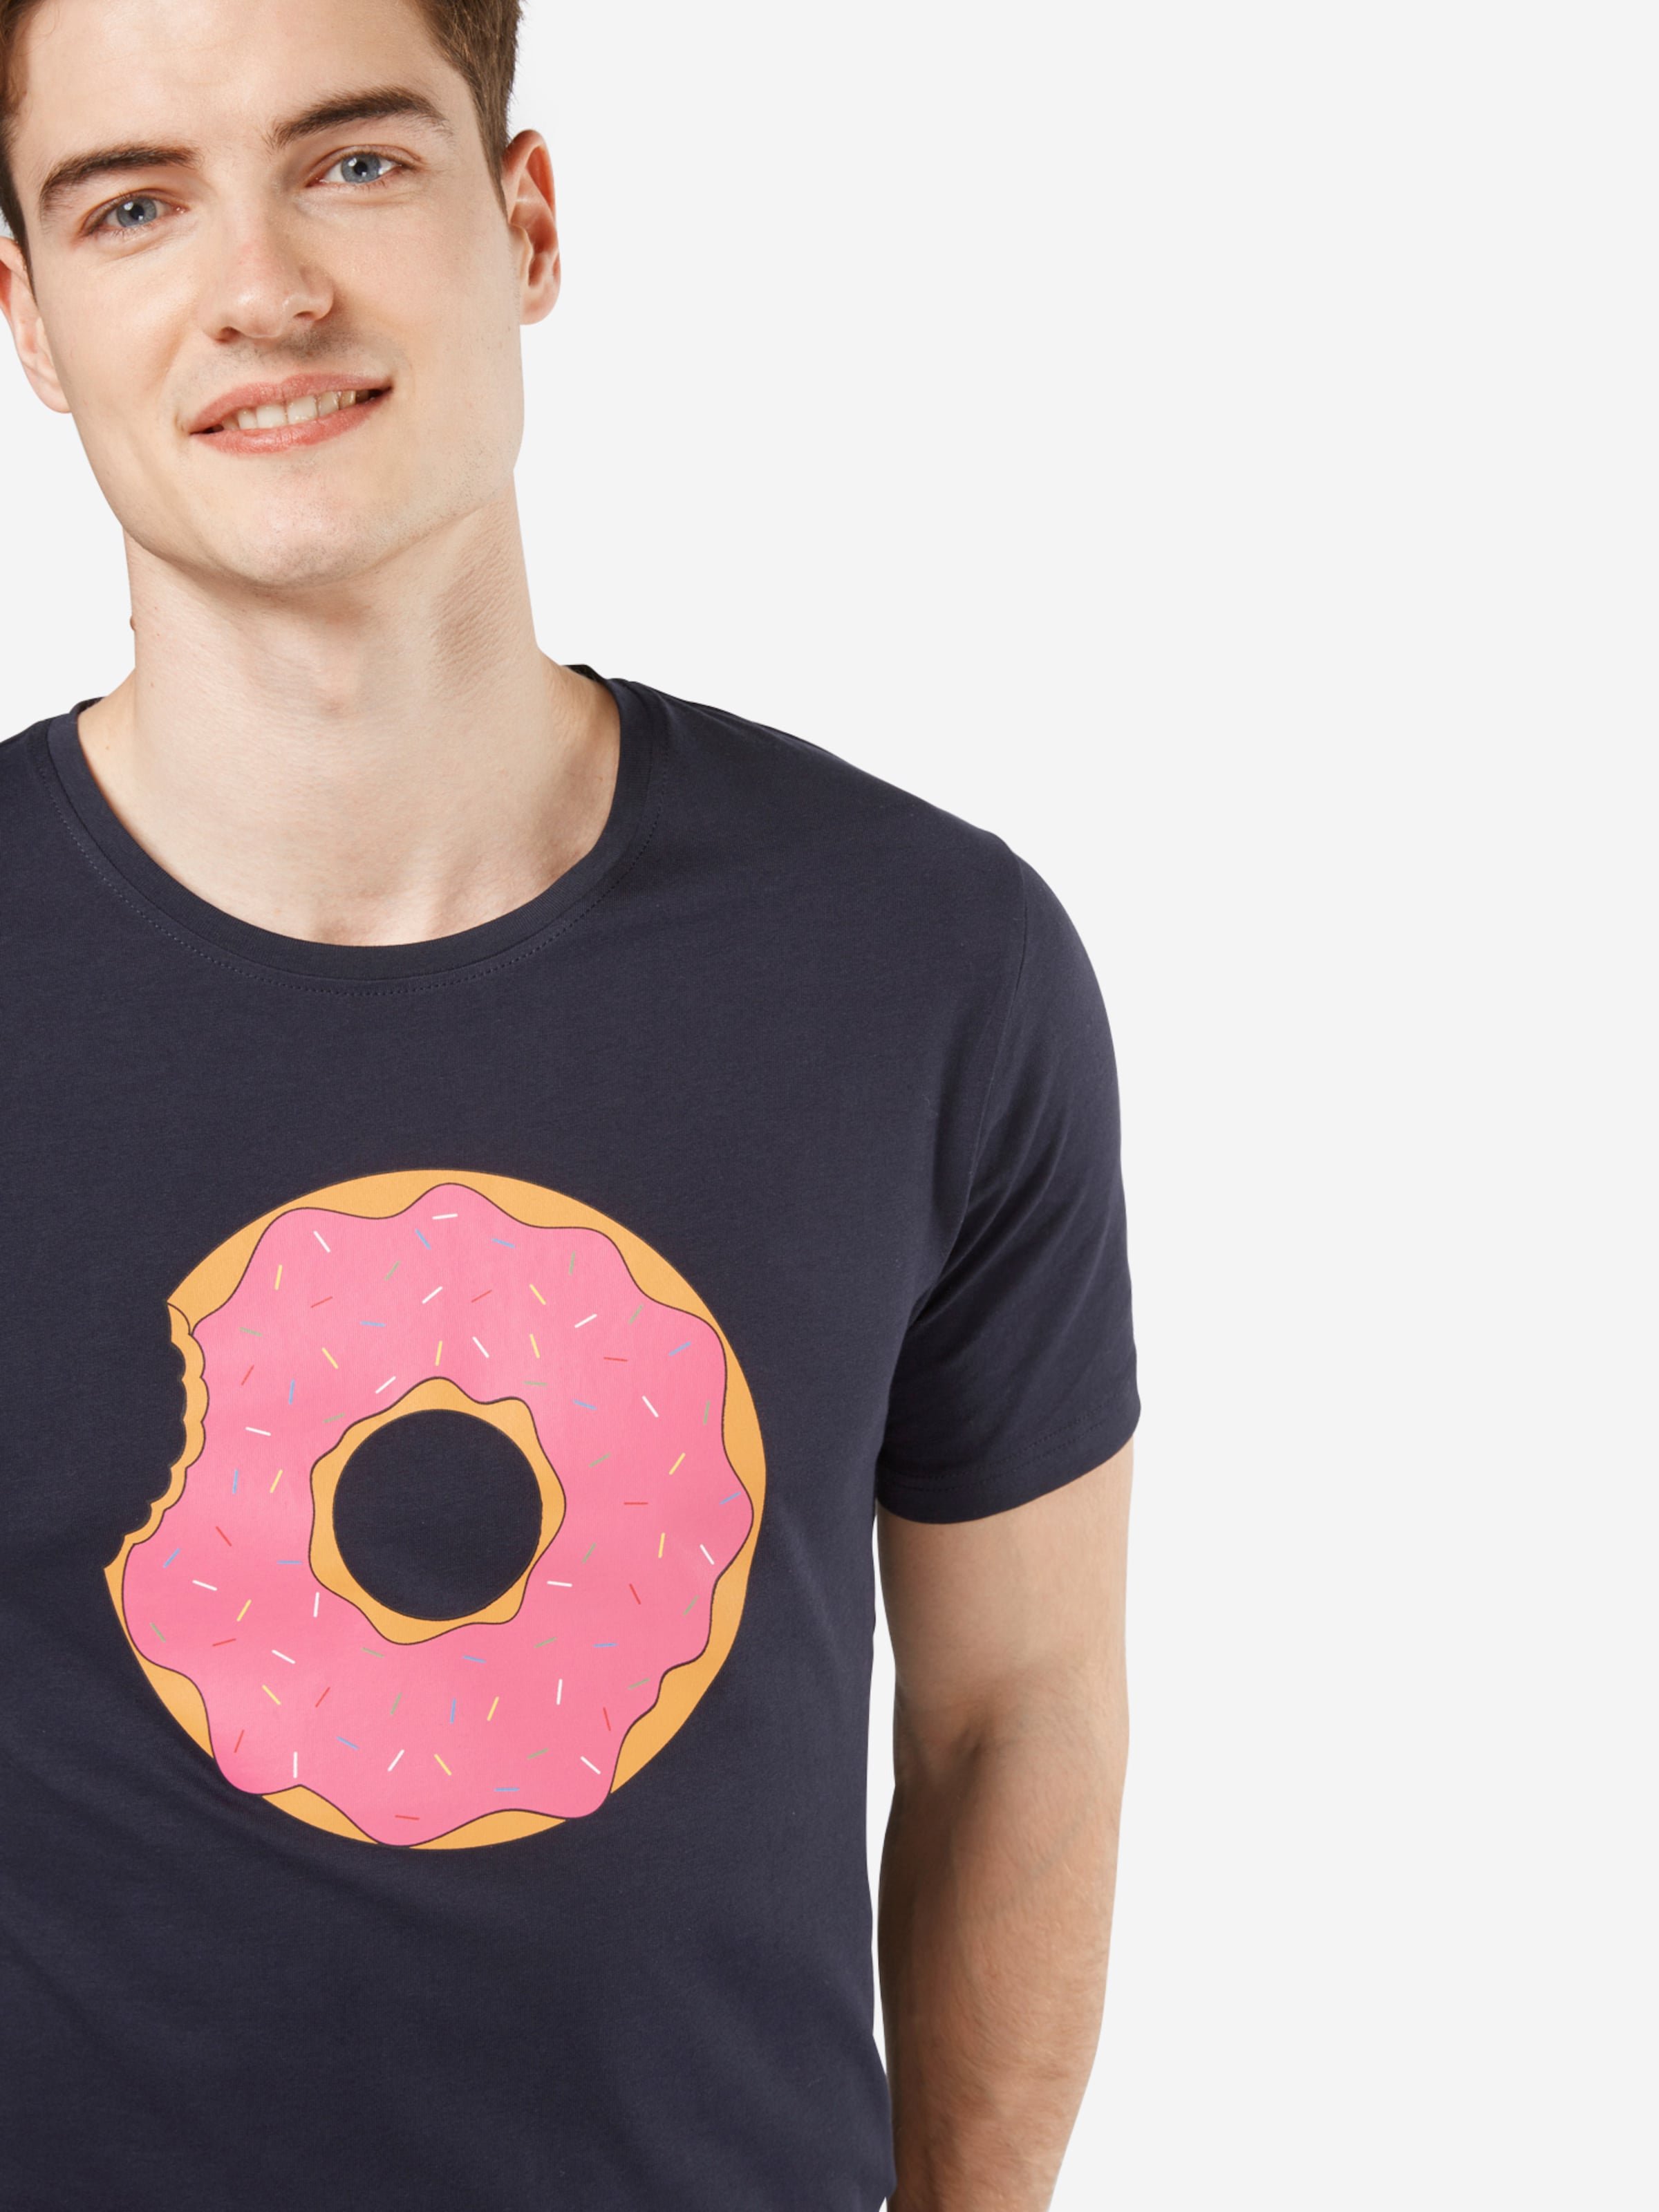 Angebot Only & Sons T-Shirt 'onsMARCO FUNNY PRINT SS EXP' Sast Günstig Online Auslass-Angebote Shop Für Günstigen Preis fQR6Z